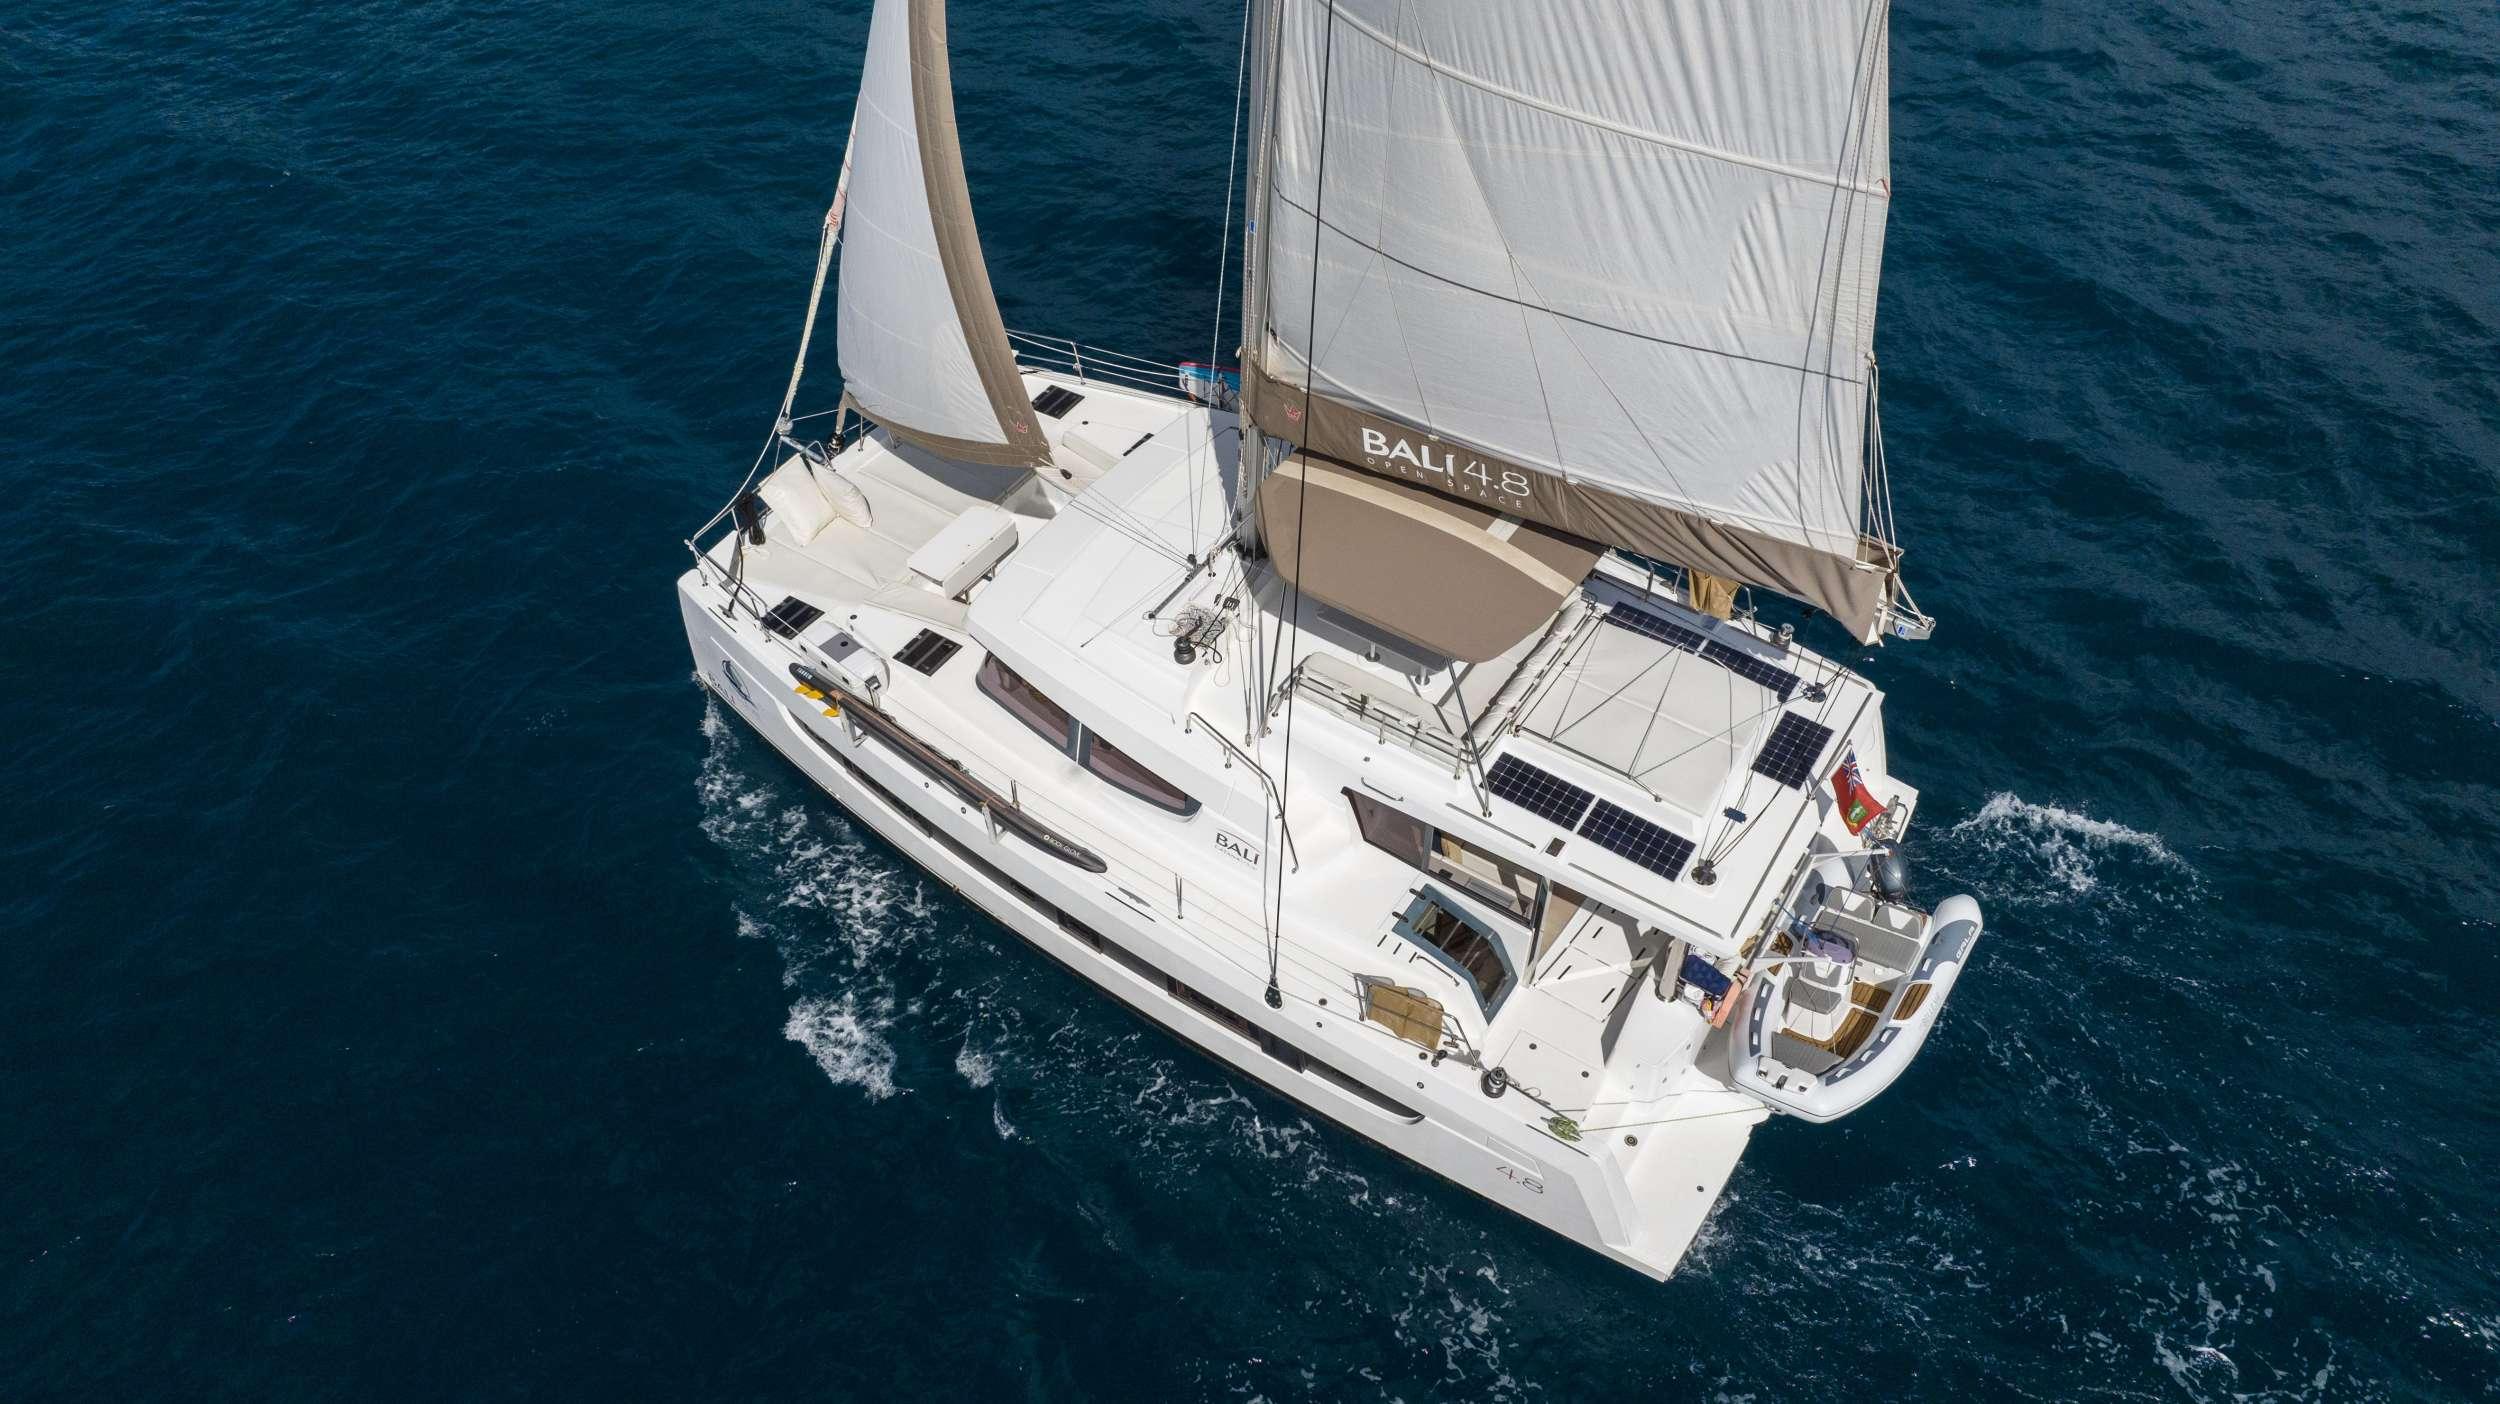 Main image of BELLE VIE yacht